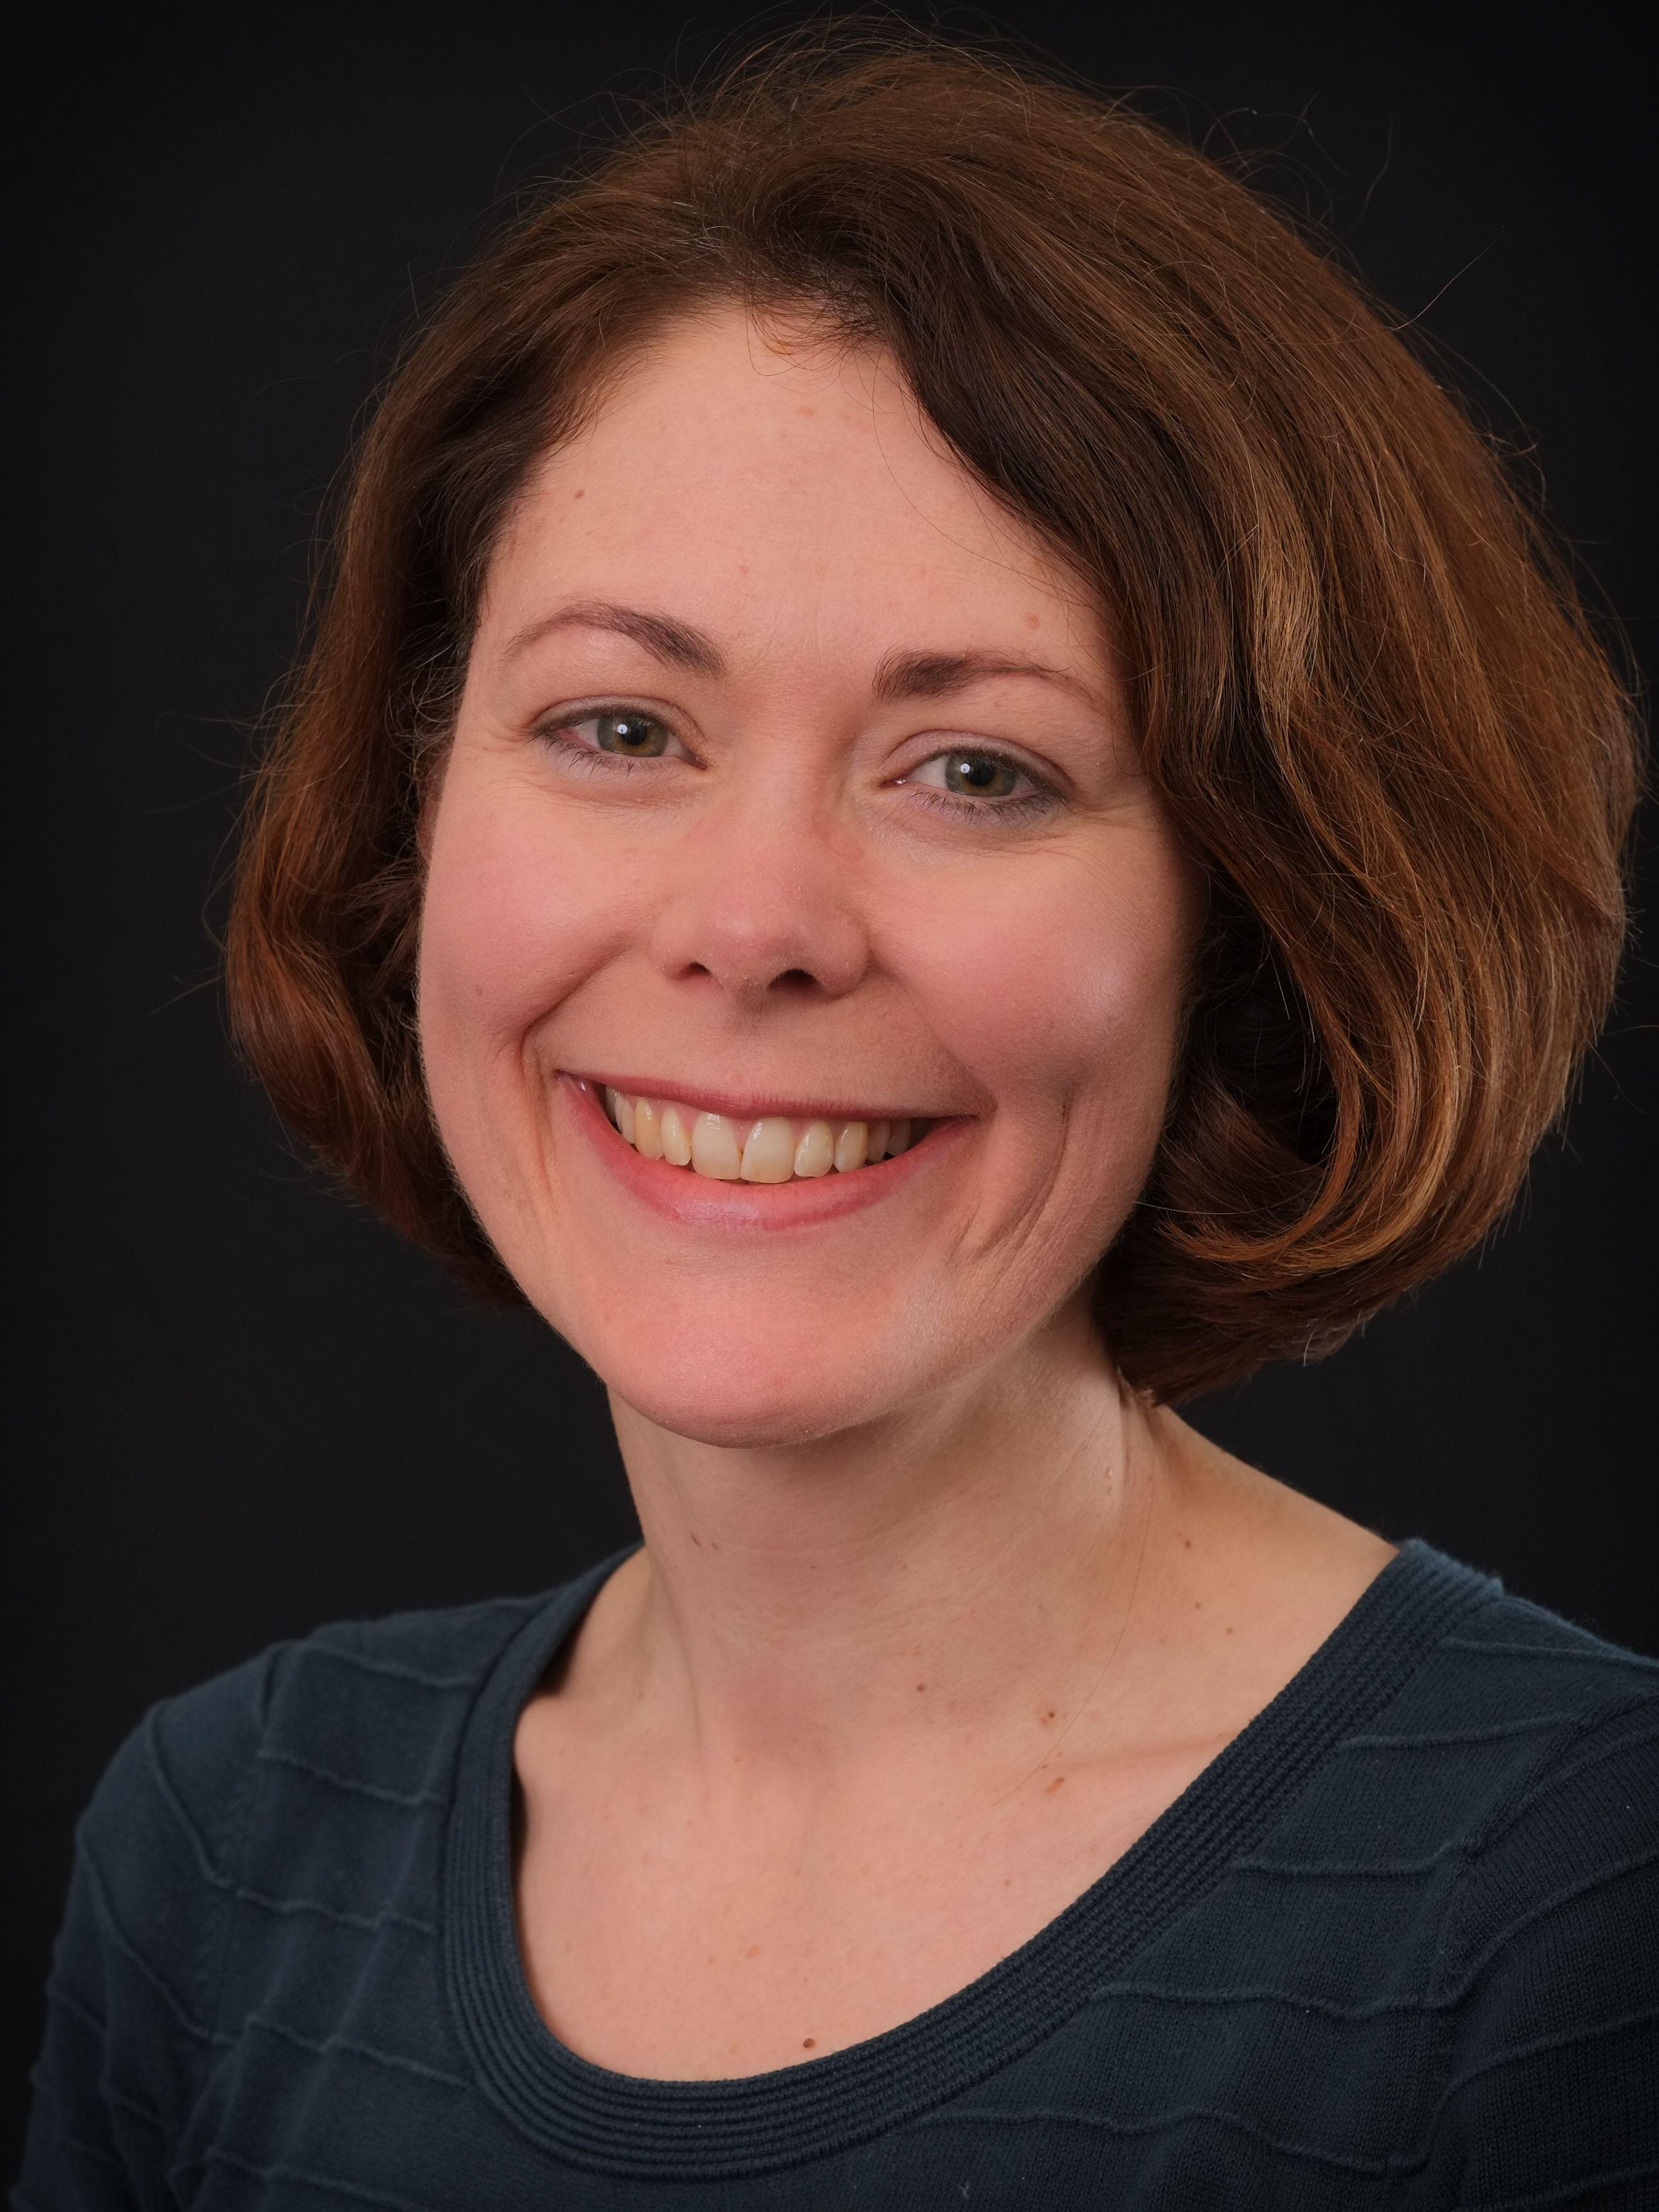 Dr Ruth Kipping